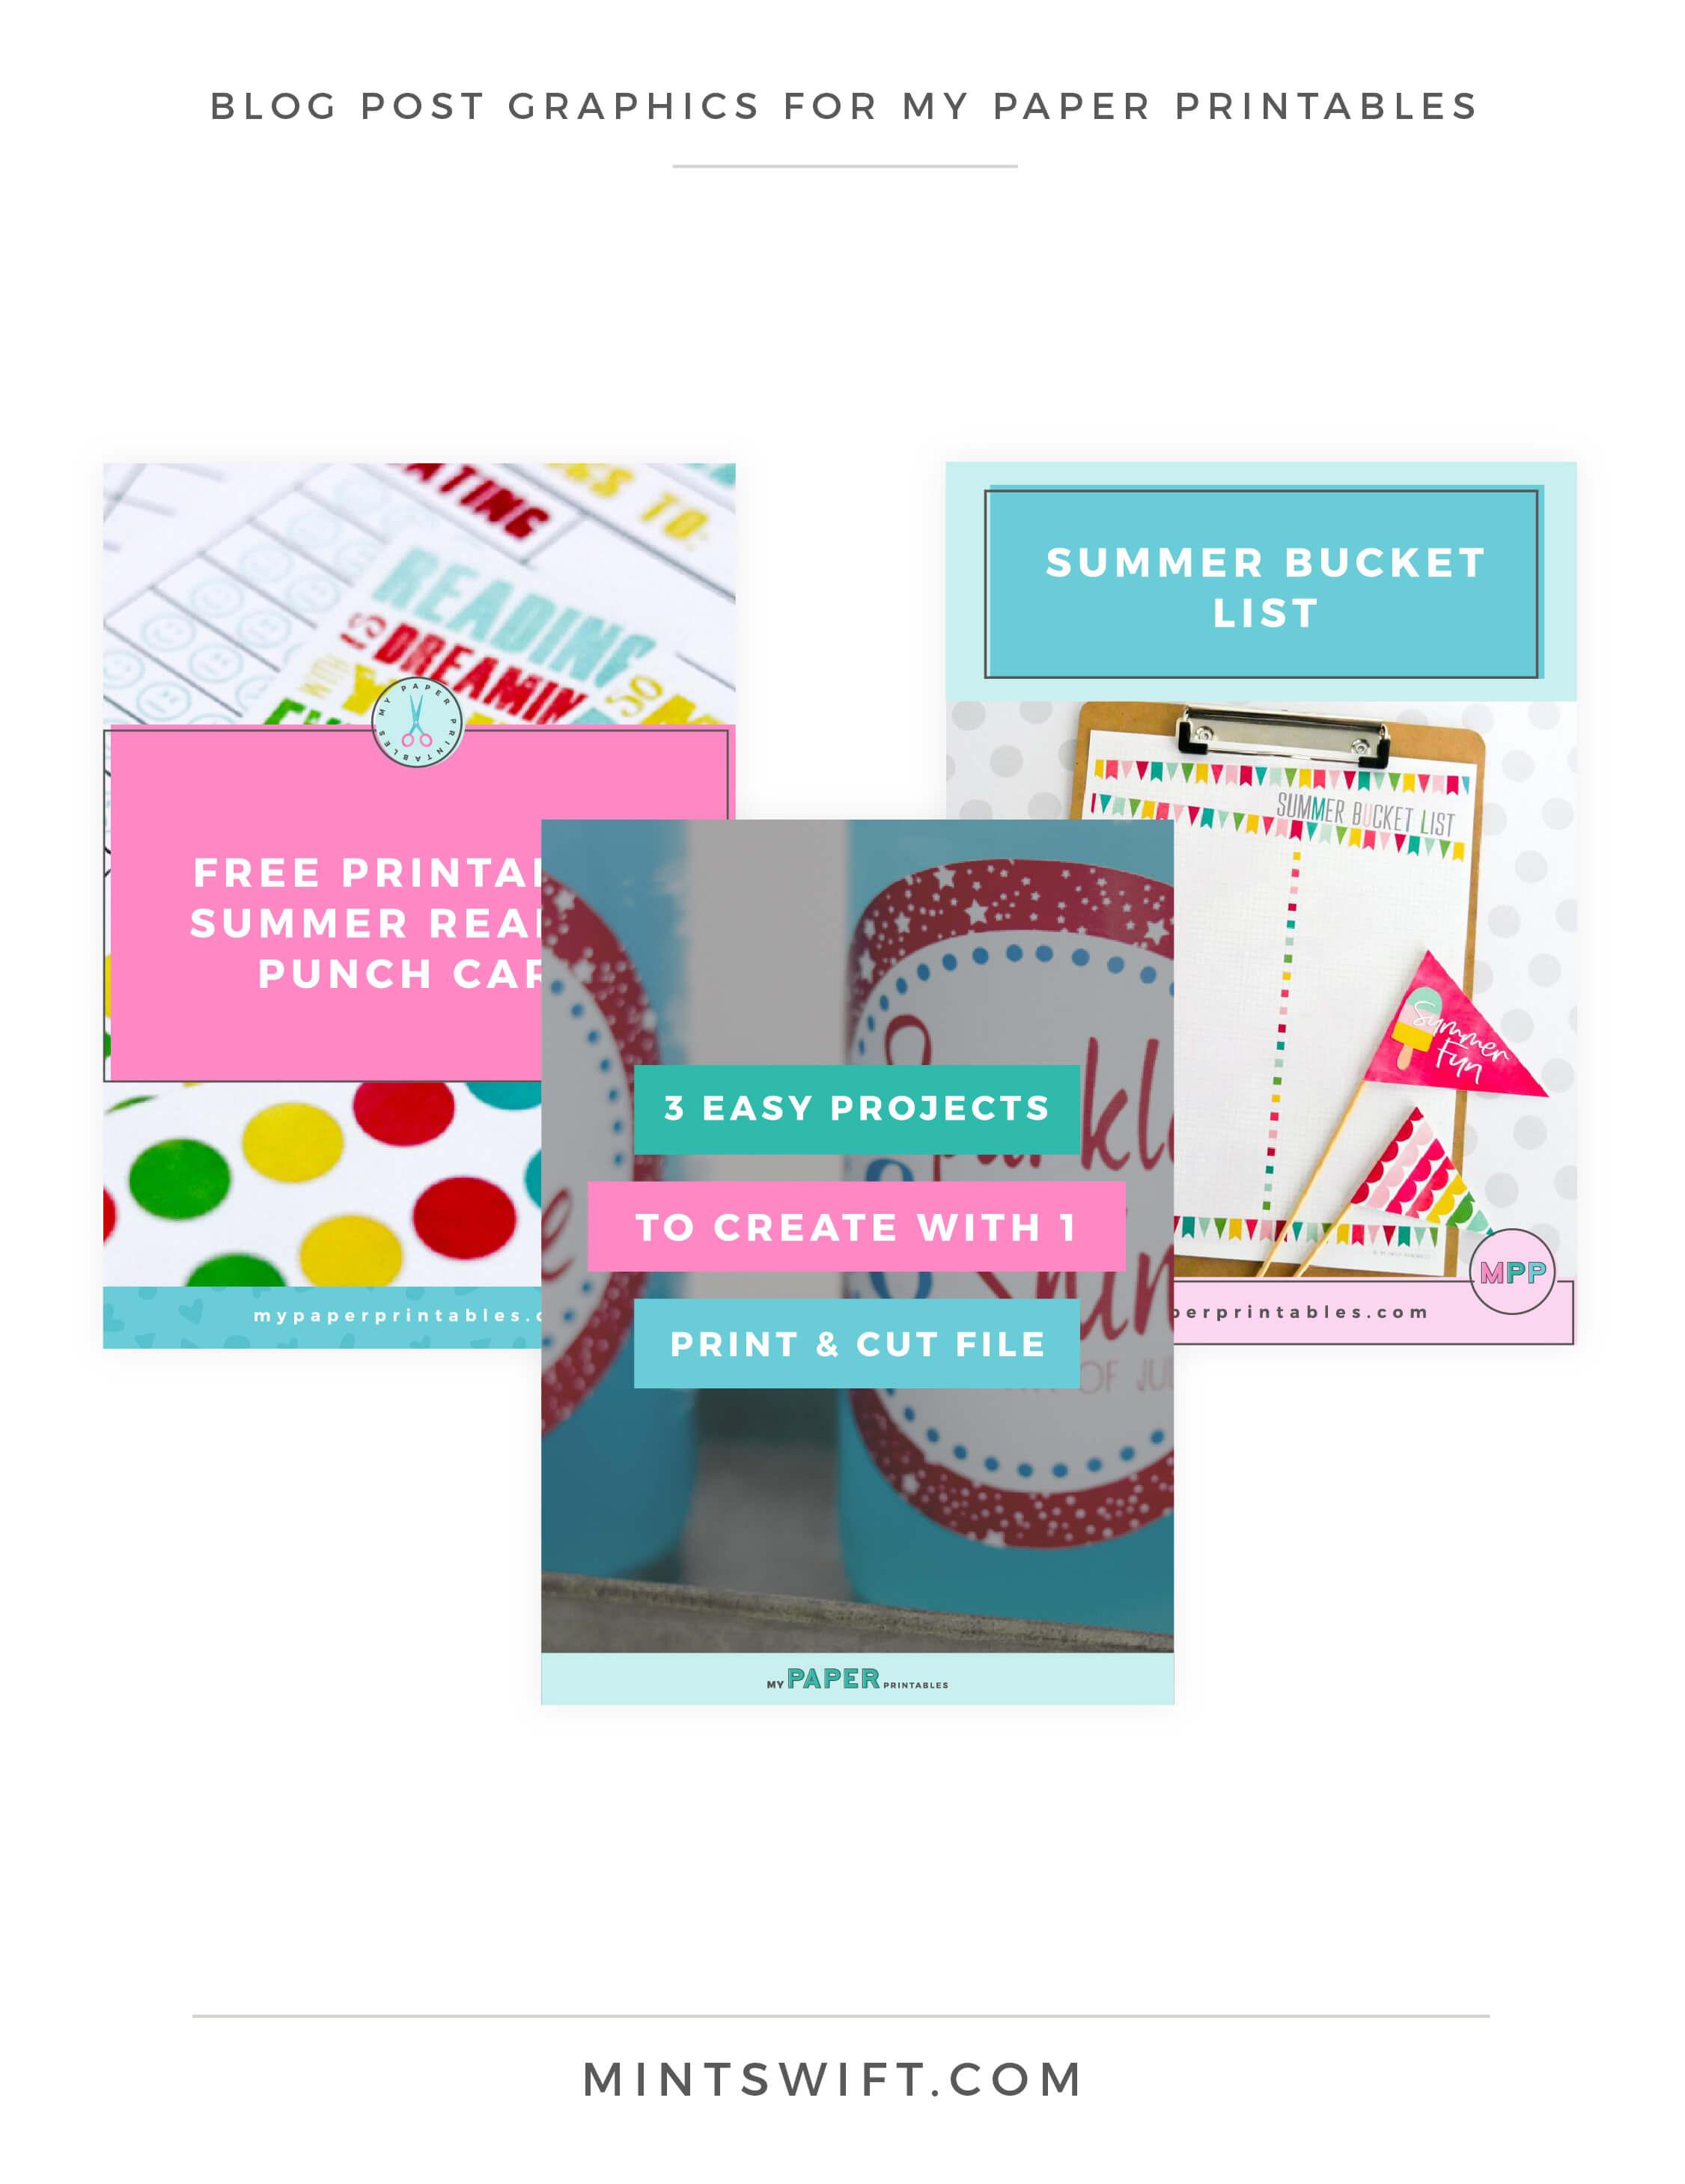 My Paper Printables - Blog Post Graphics - Brand Design - MintSwift